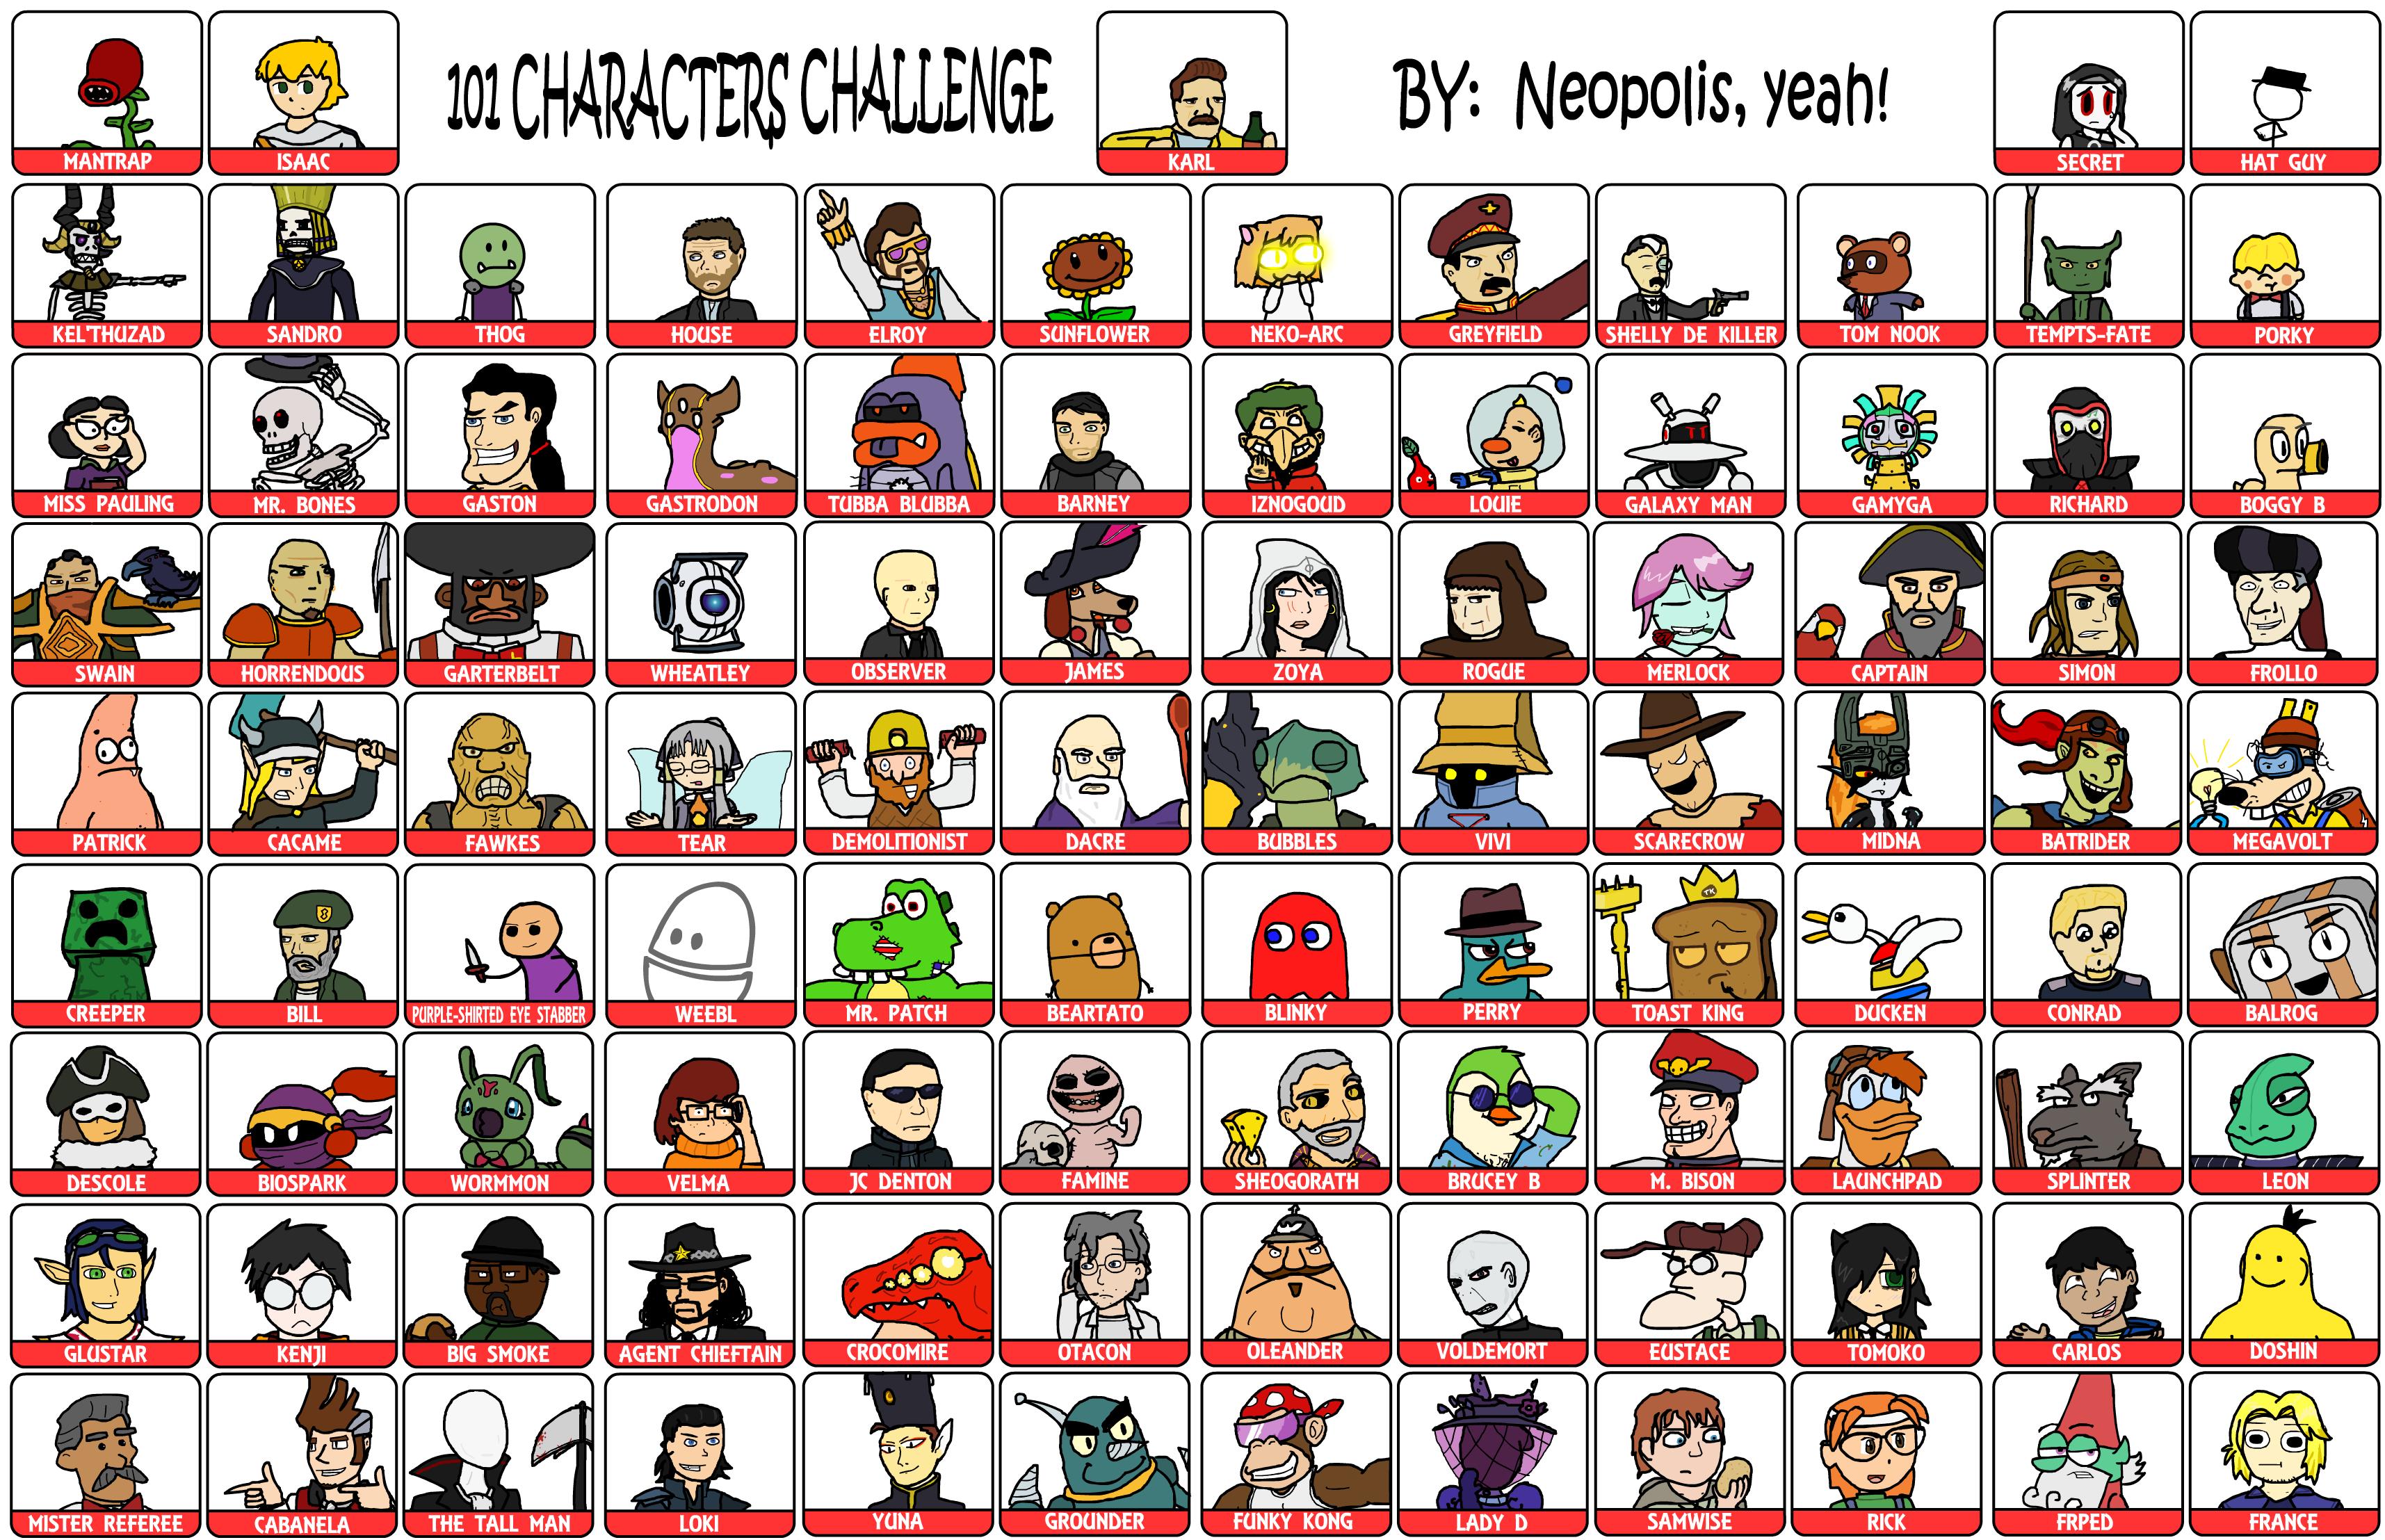 101_characters_meme__final__by_neopolis d5bwzmy 101 characters meme (final) by neopolis on deviantart